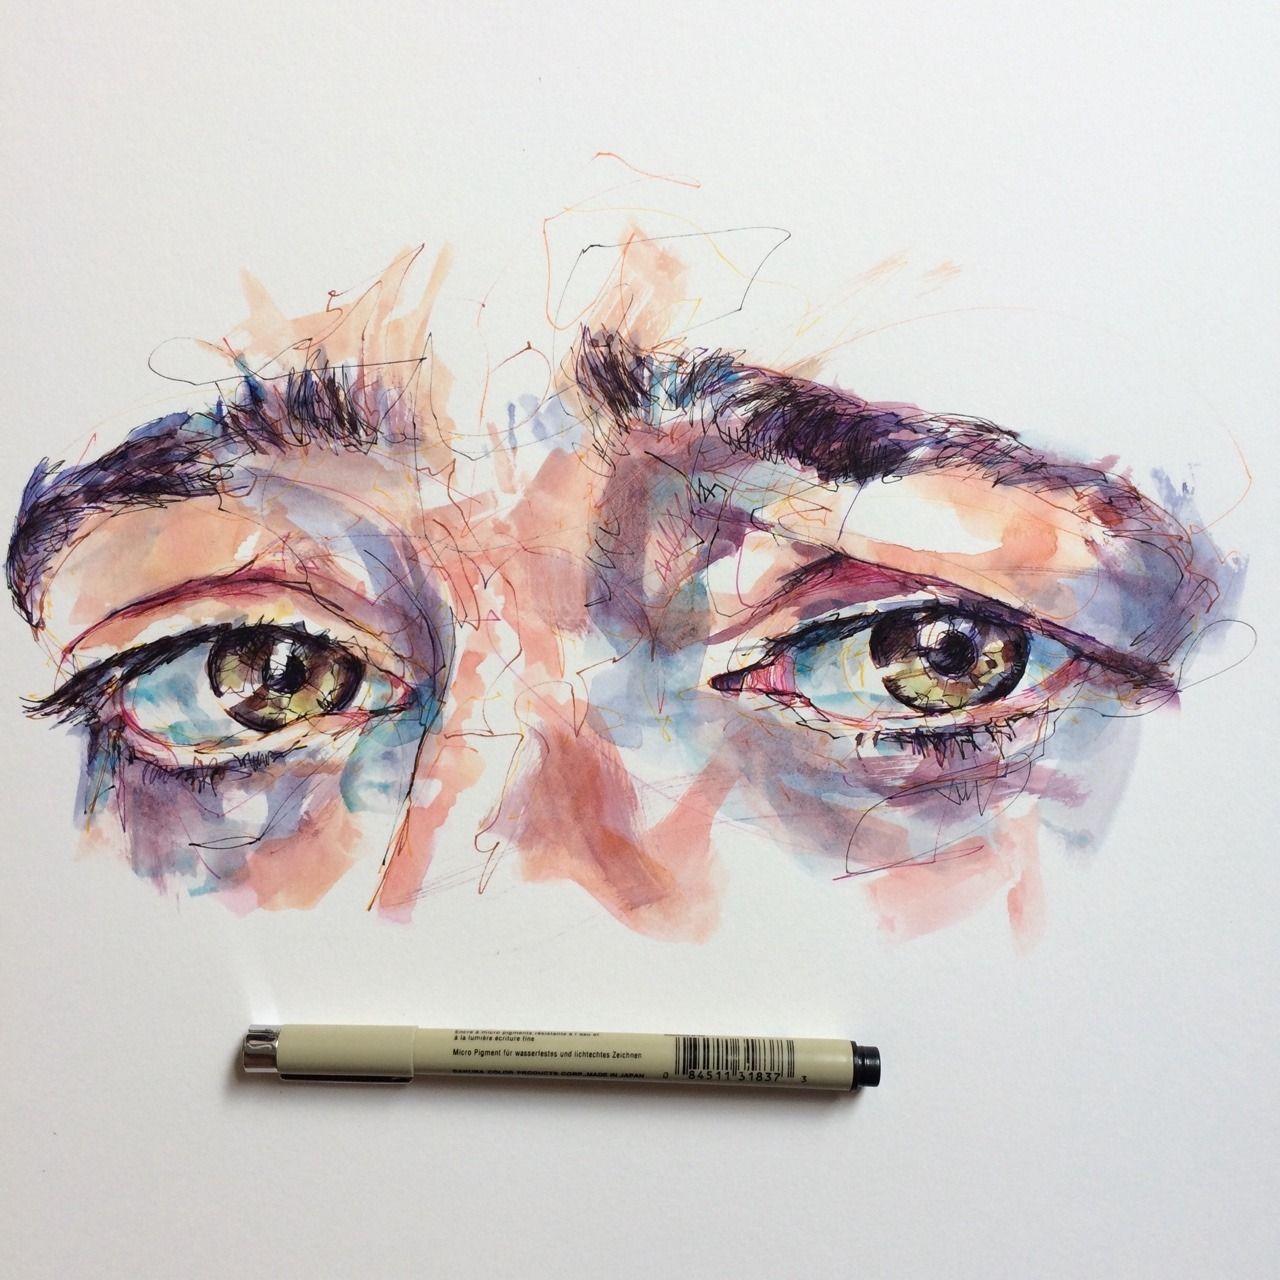 Polaroid Illusion Anamorphosis 3d Drawings Illusions